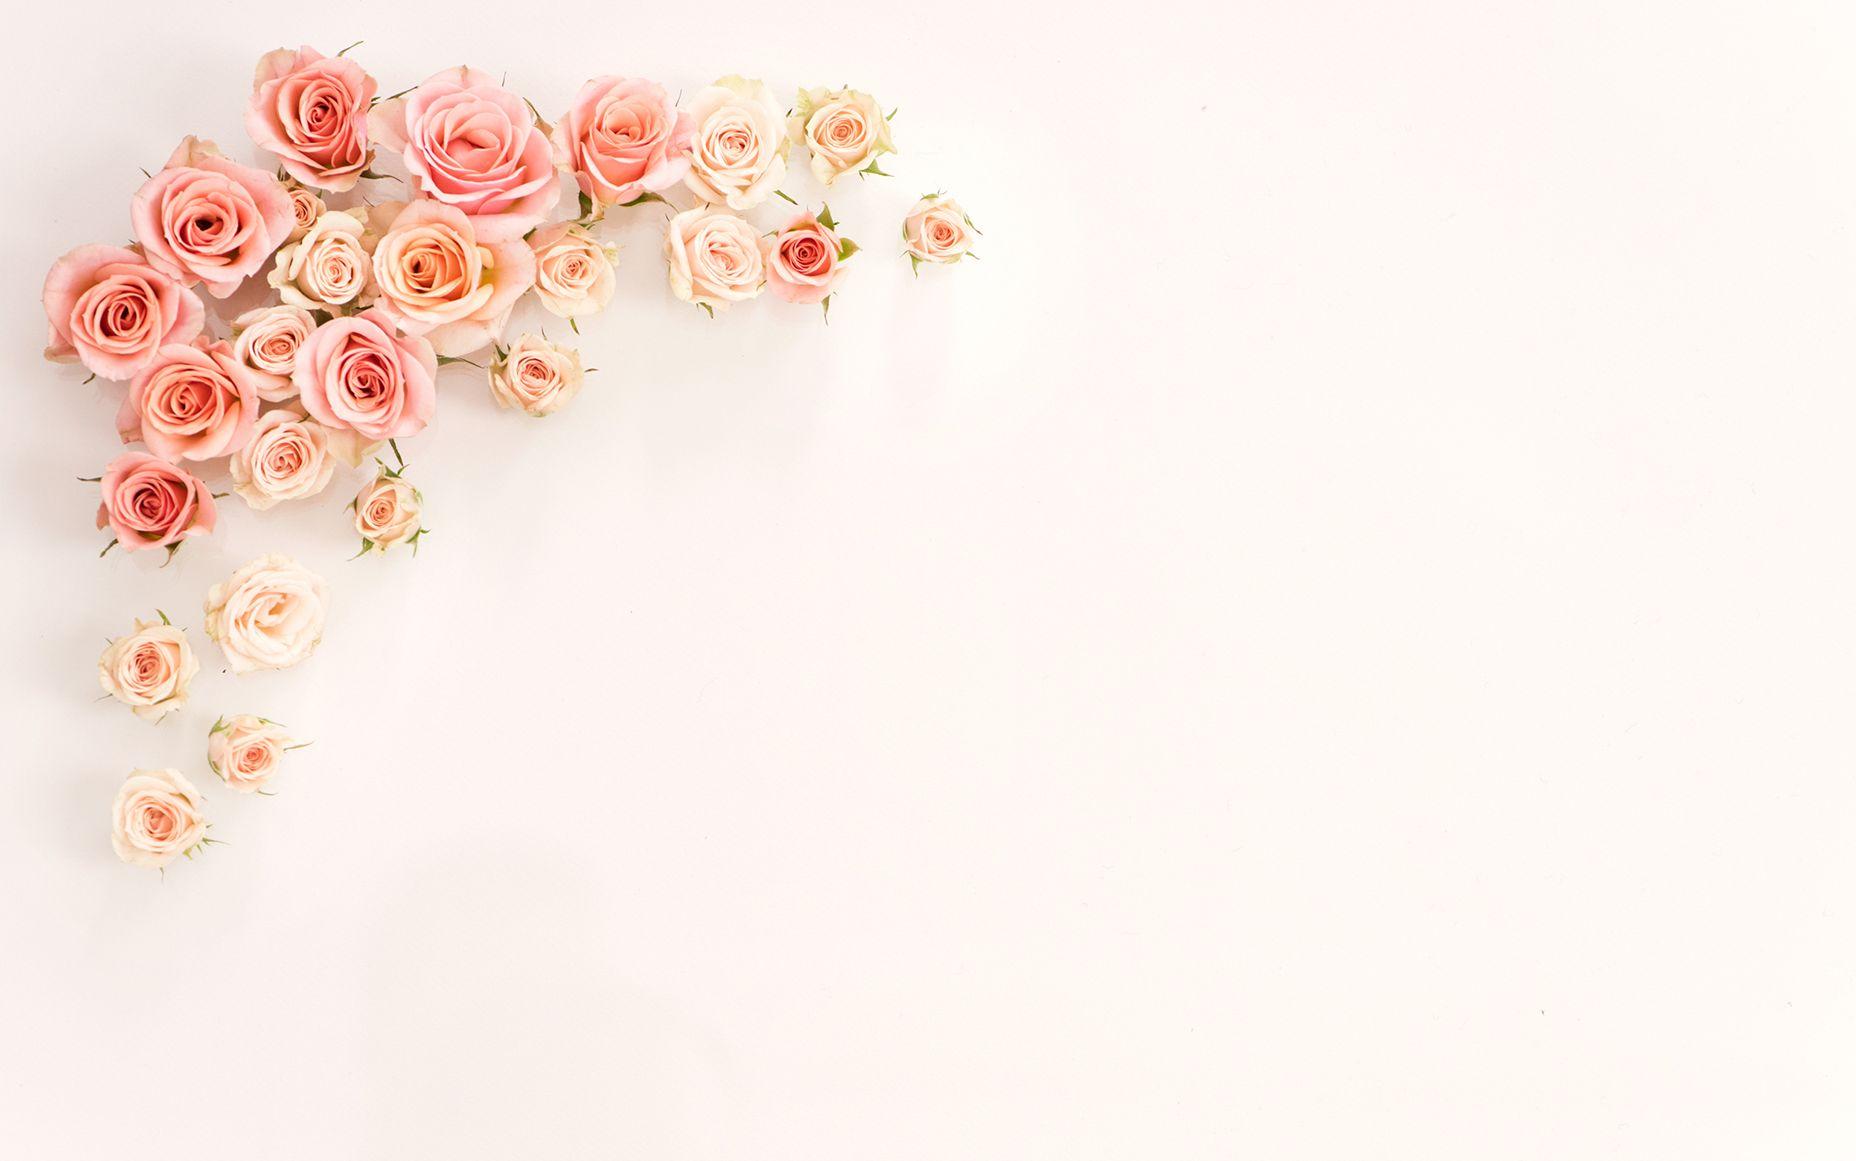 204 2048267 pink and gold desktop wallpaper rose gold aesthetic